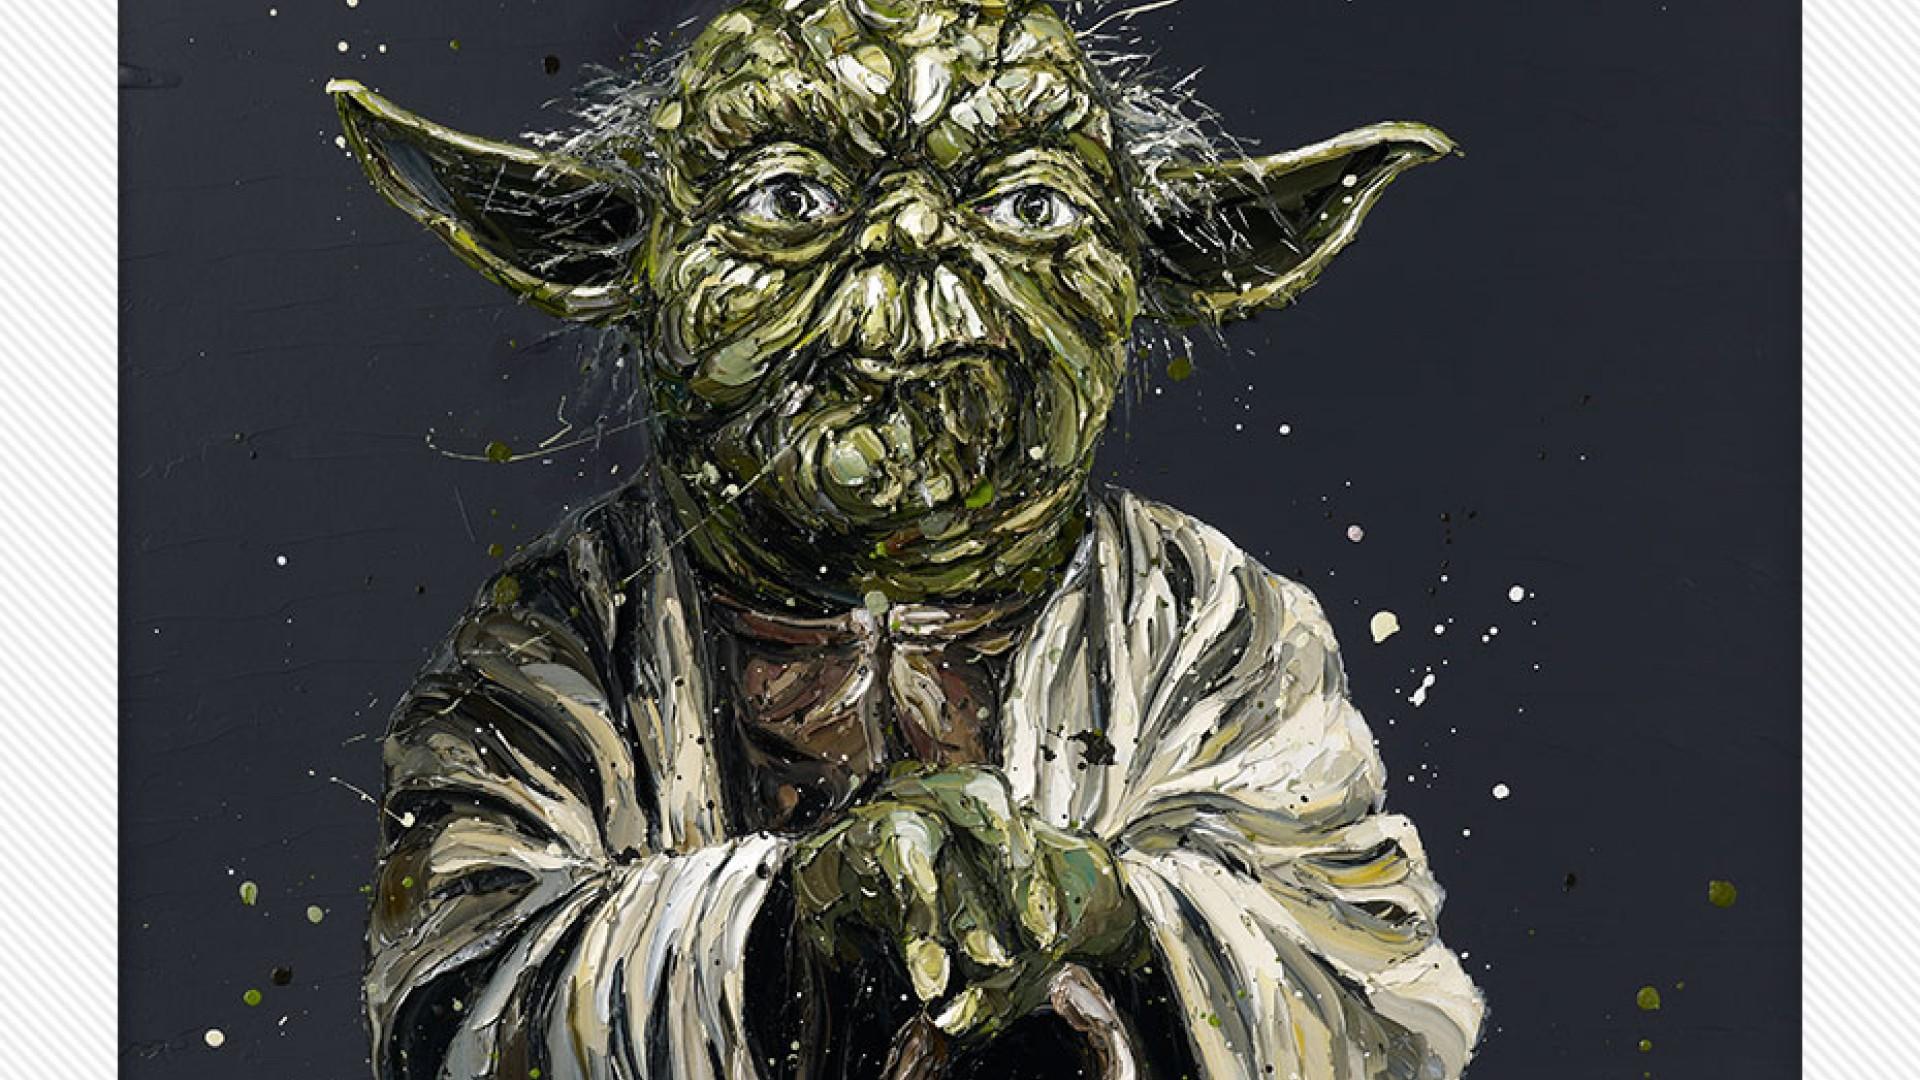 Yoda Face detail by Paul Oz